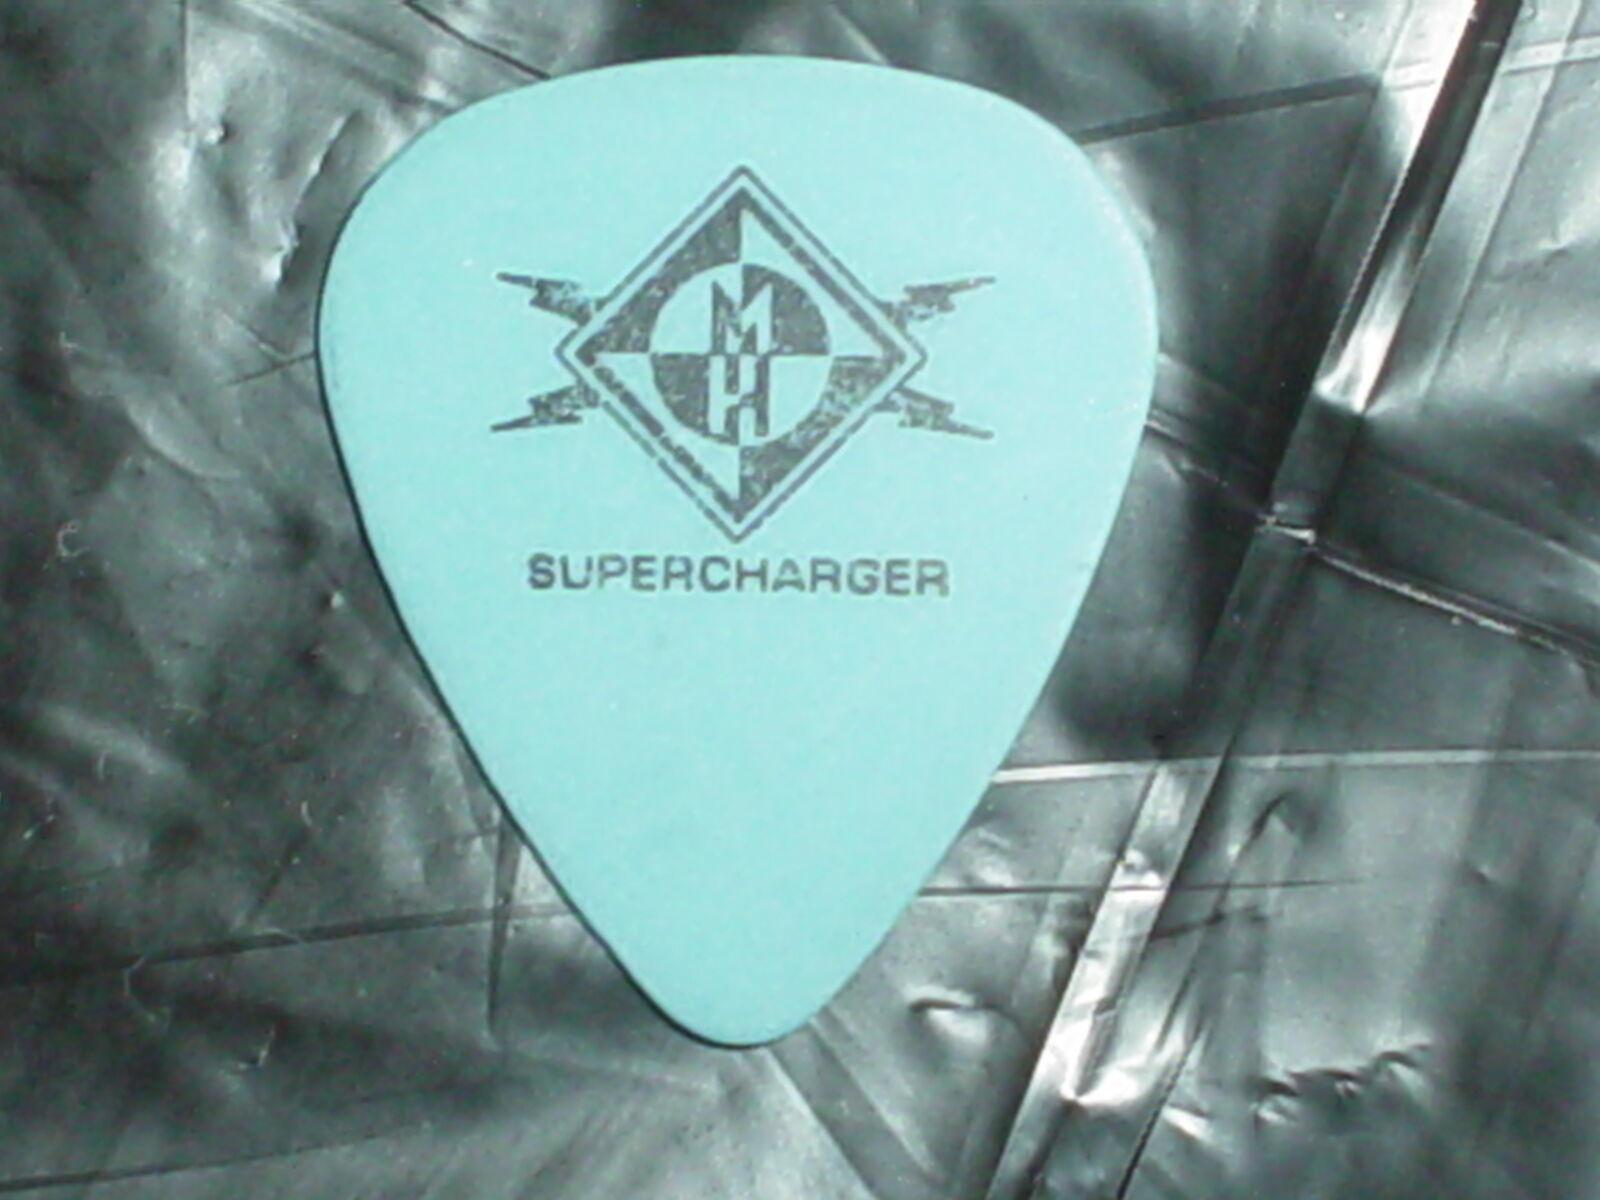 MA NE HEAD Logo & Ahrue Lusters SIGNATURE 2004 SUPERCHARGER Tour GUITAR PICK